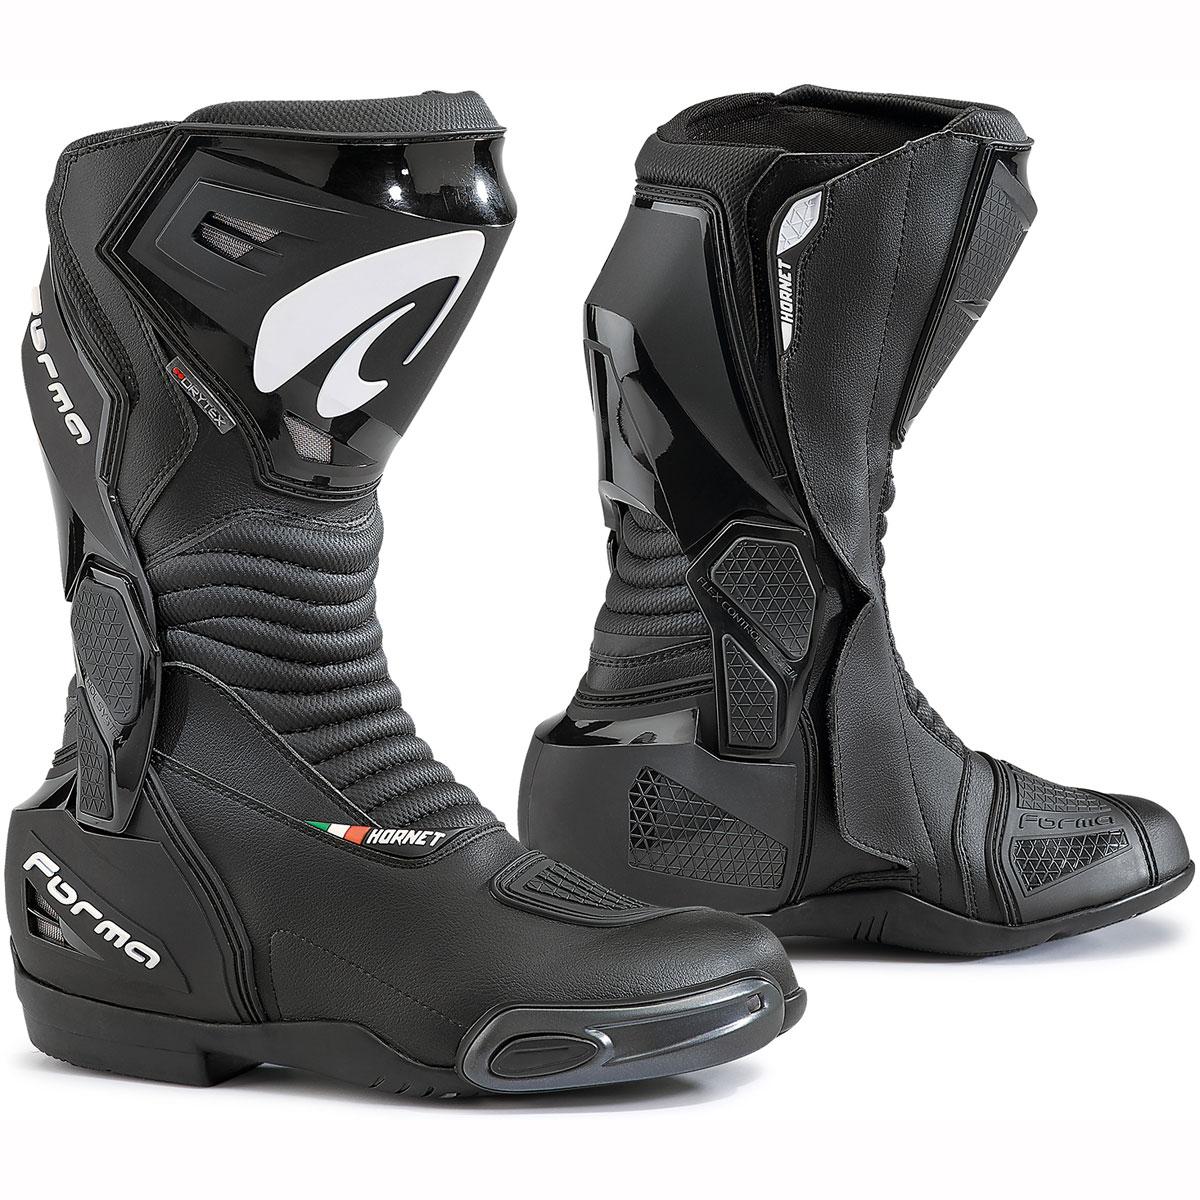 Forma Hornet boots